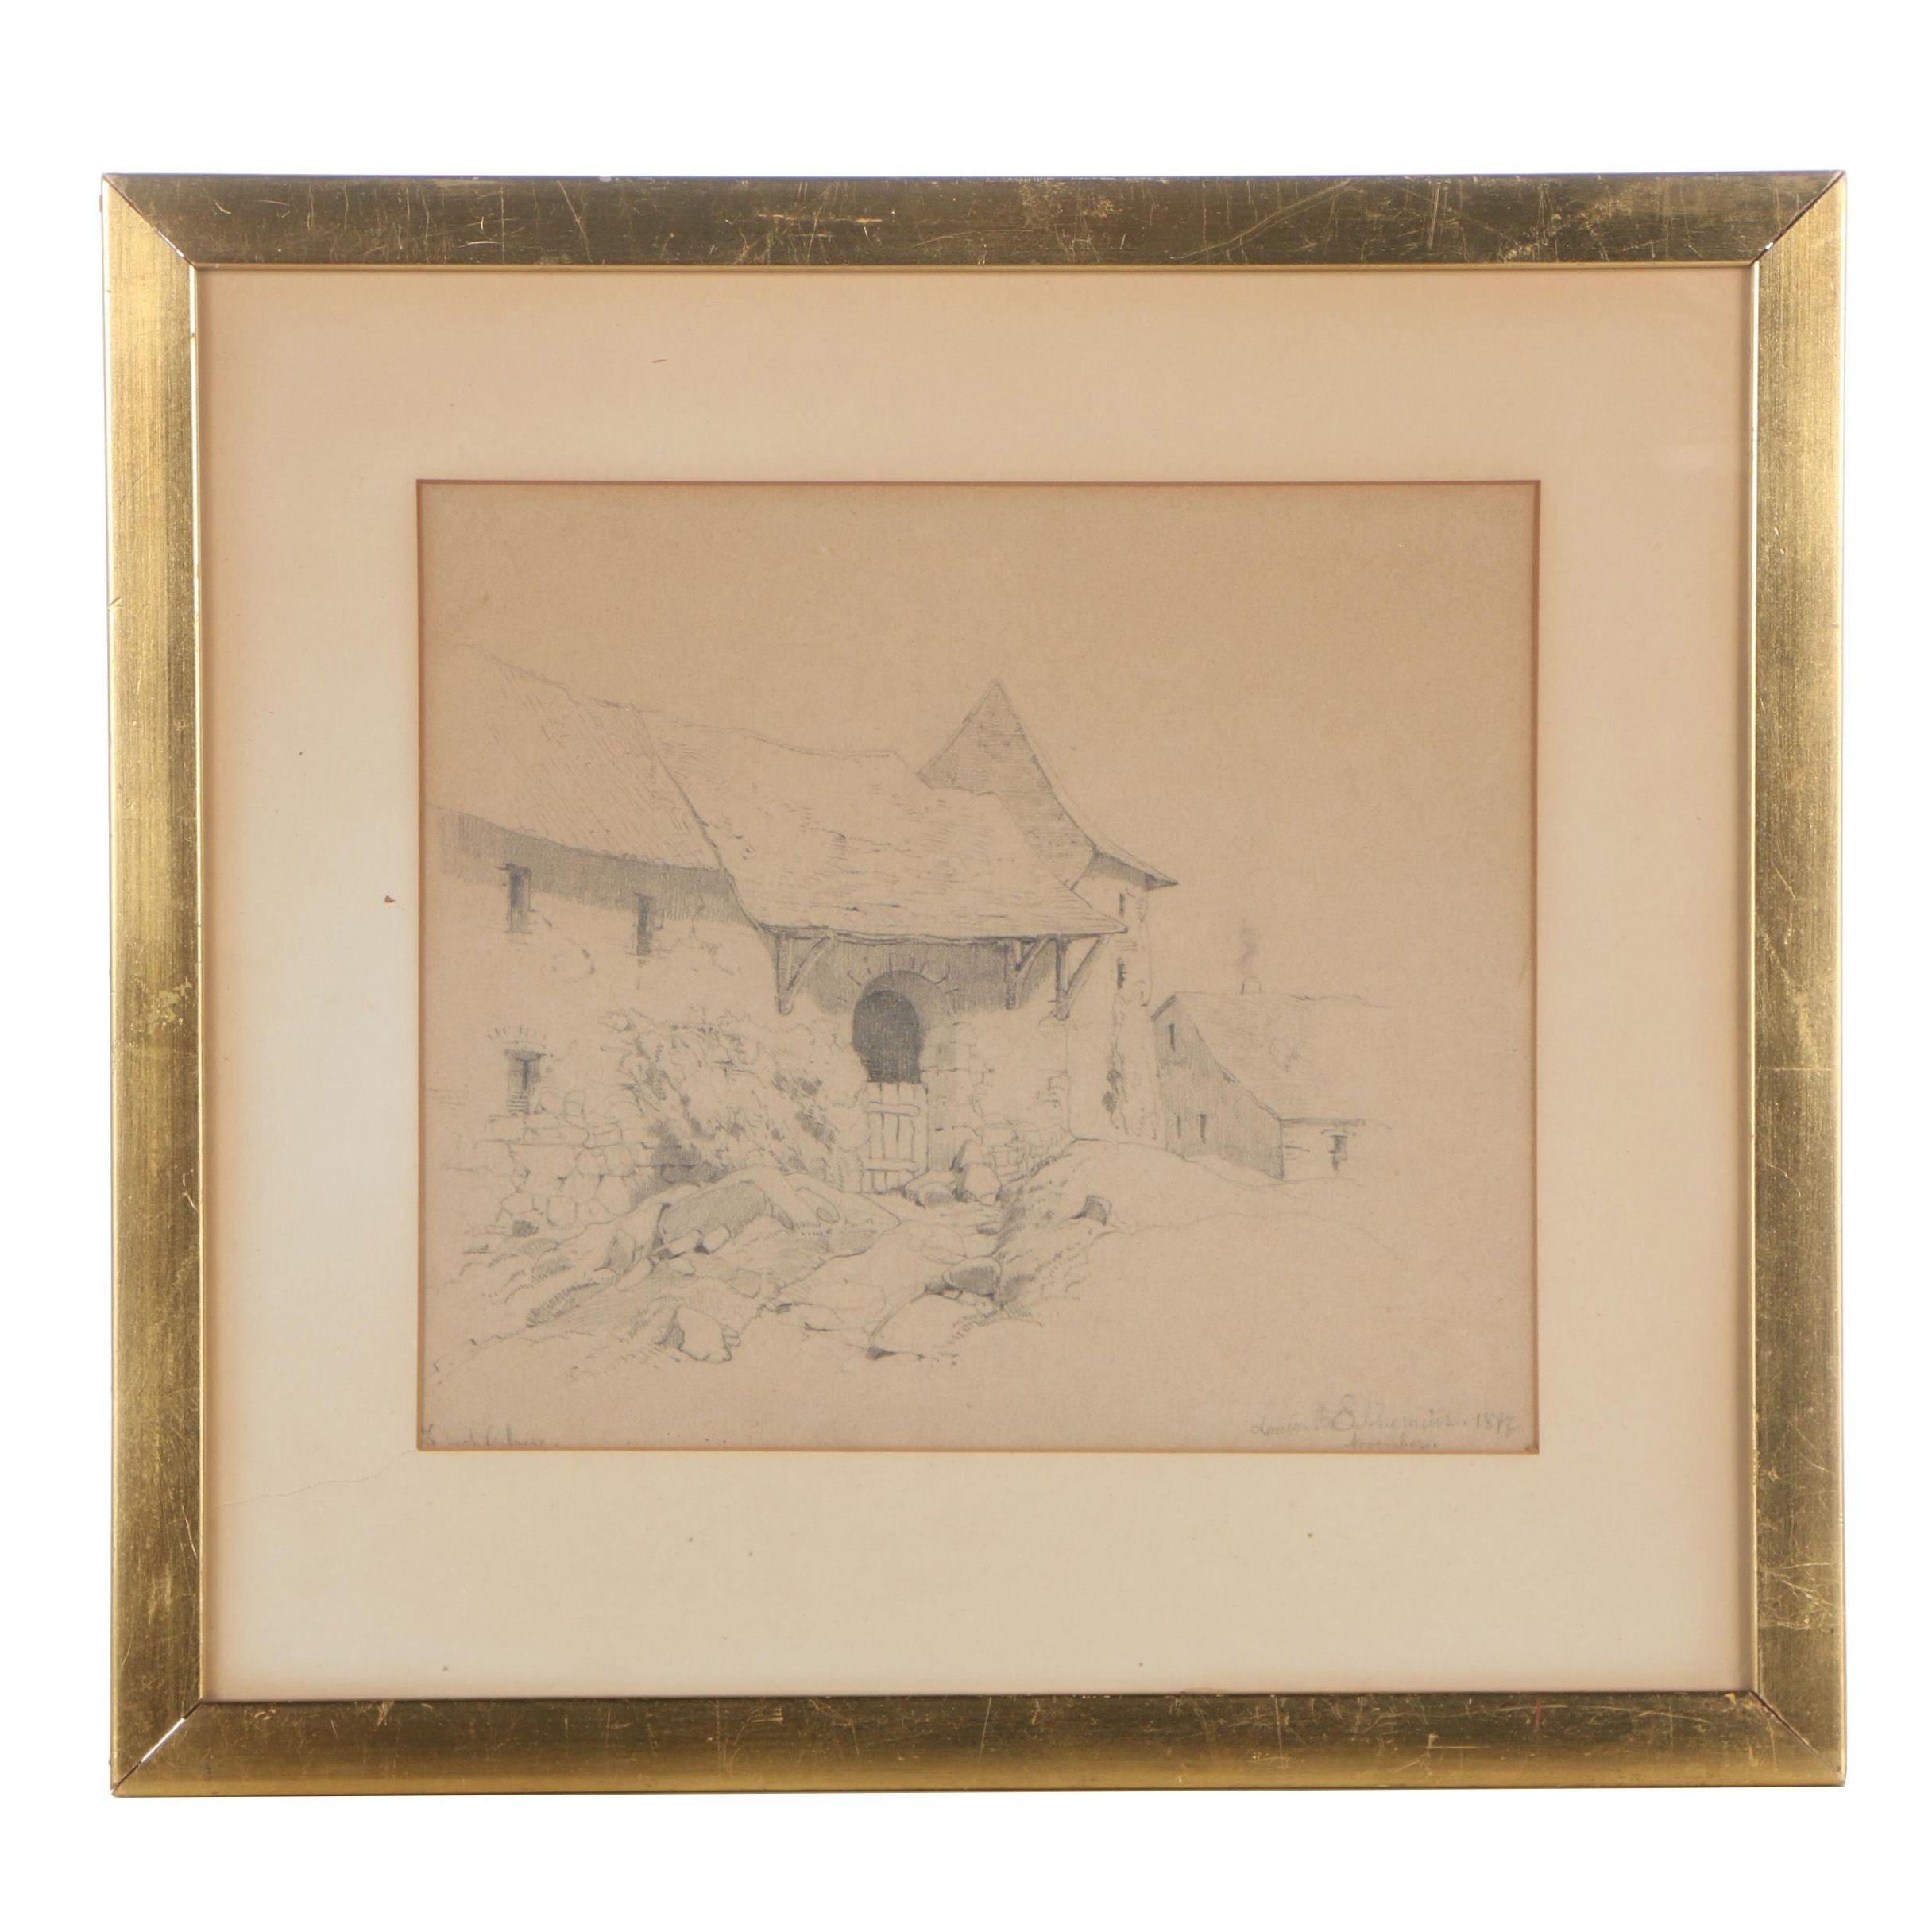 Louis Michel Eilshemius Graphite Drawing